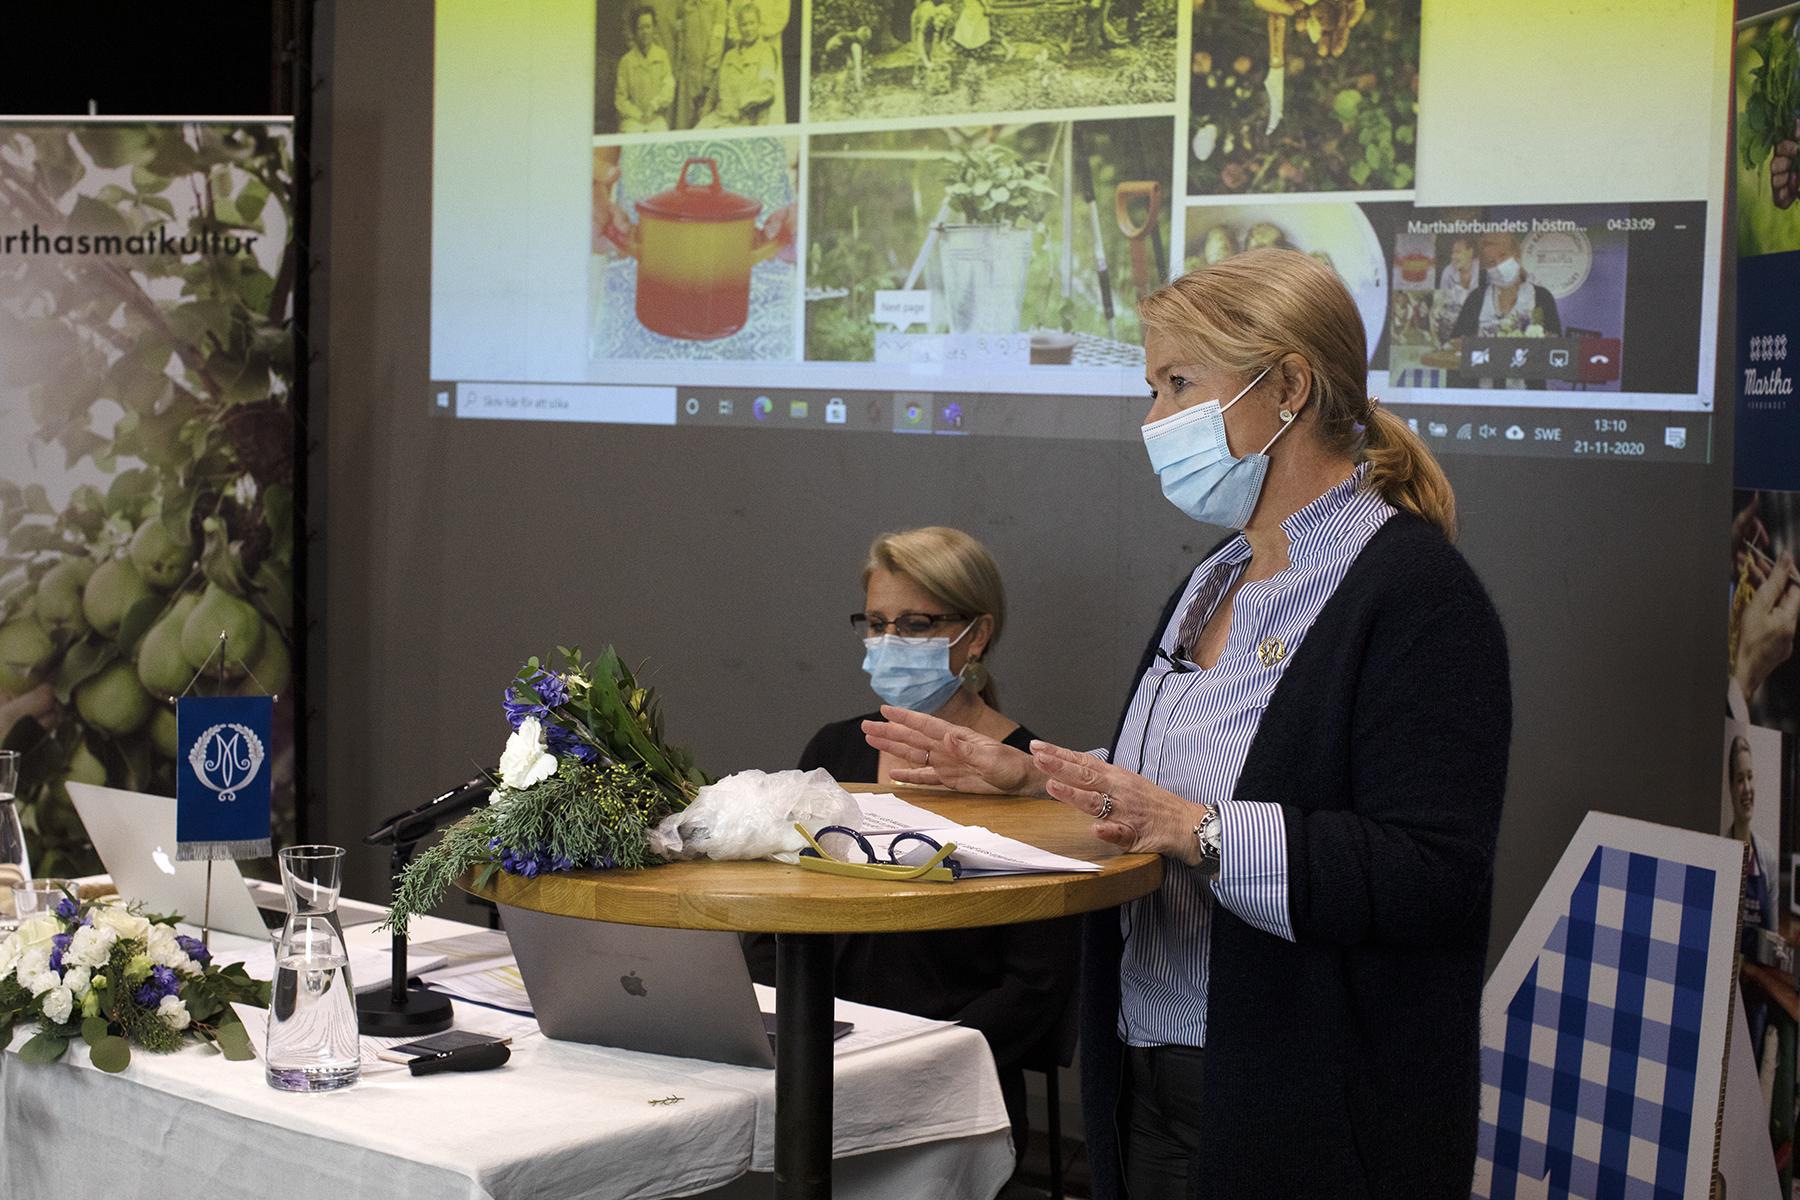 Marthaforbundet hostmote 2020 w